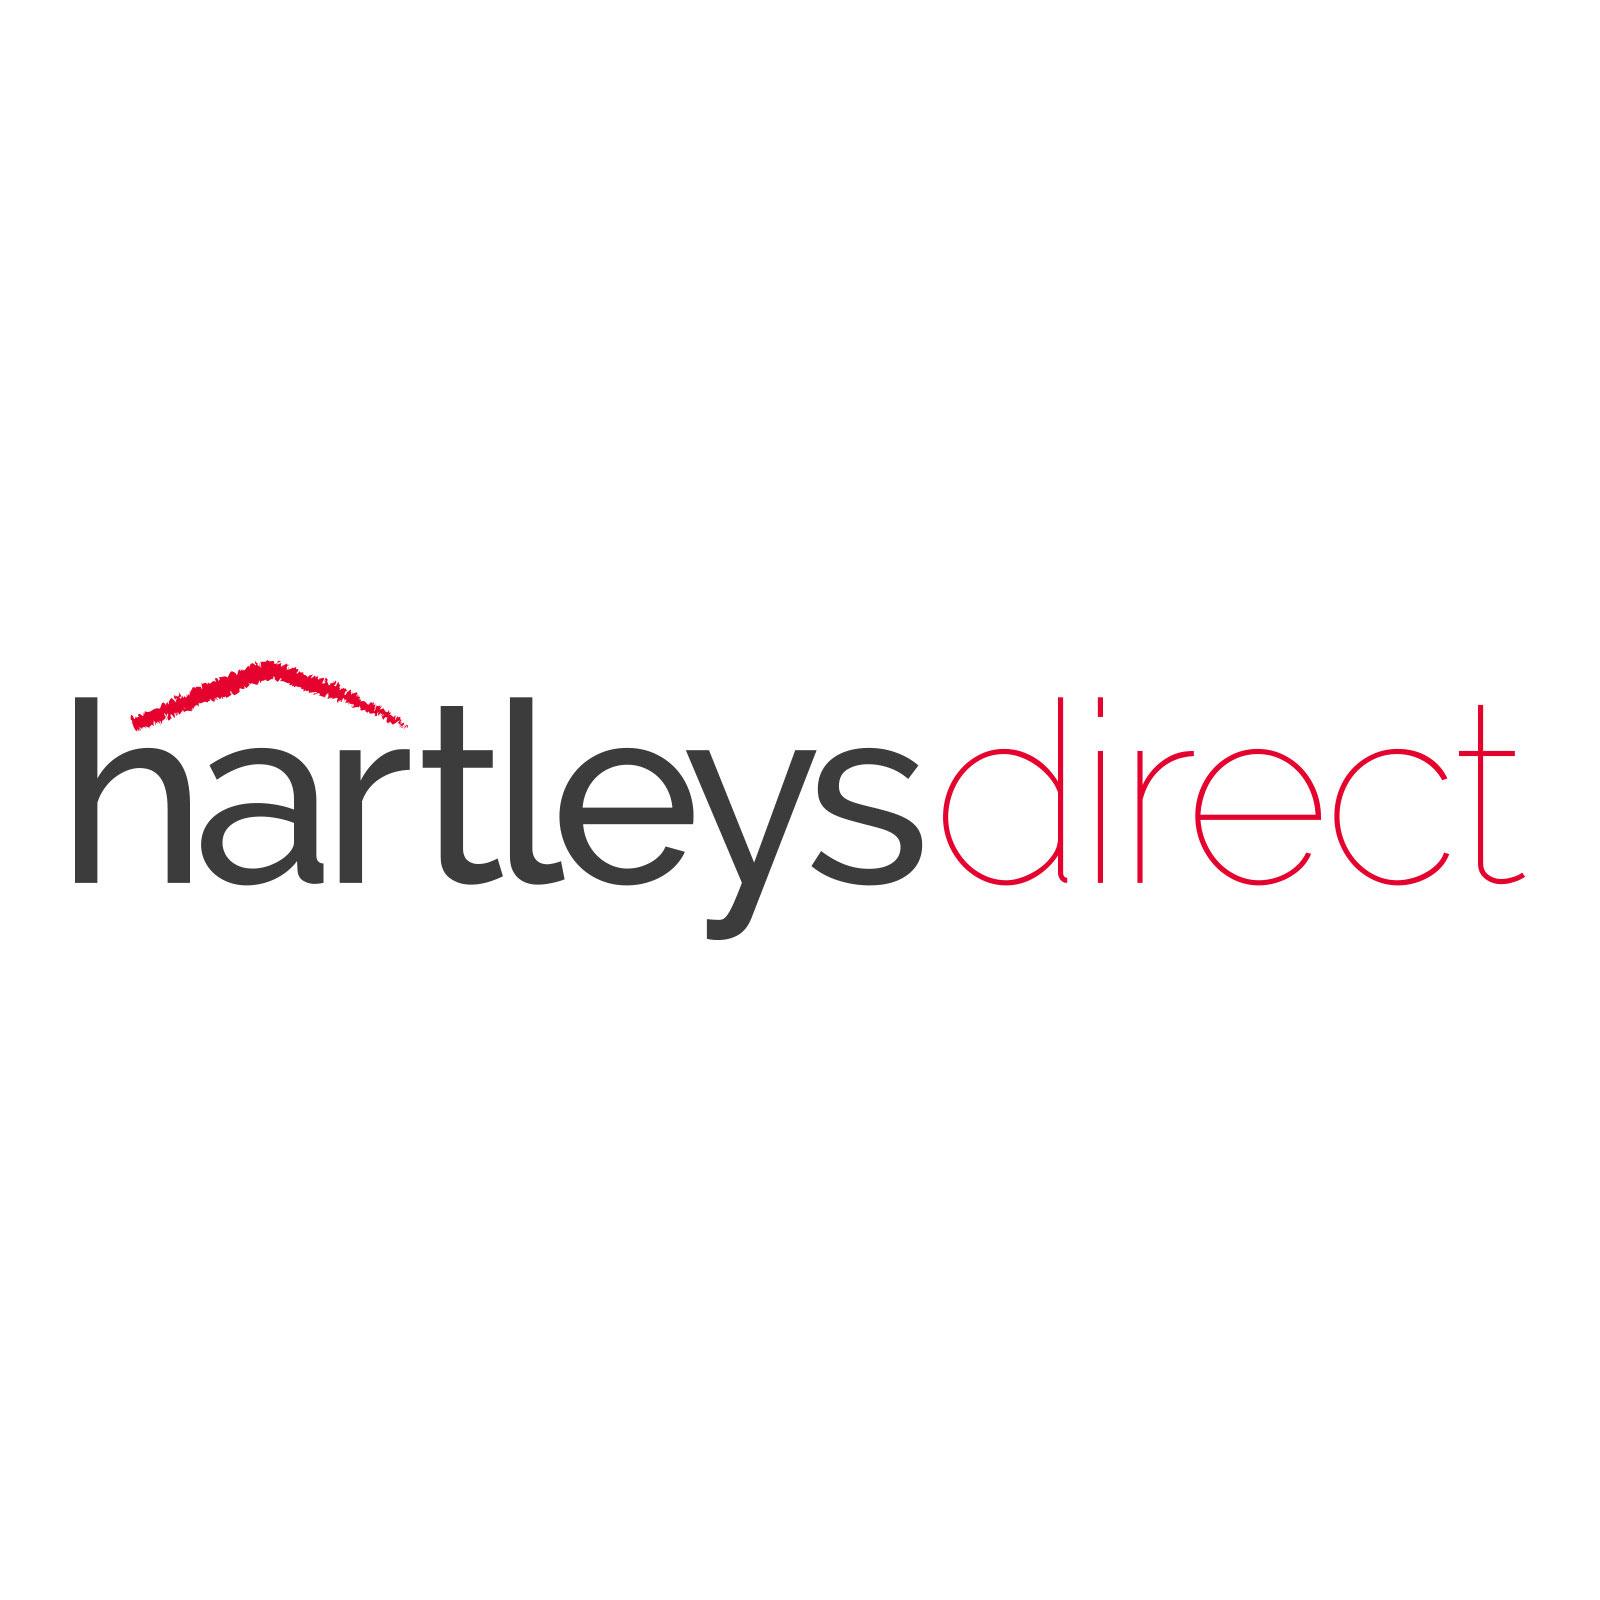 Hartleys-Folding-3ft-Square-Table-on-White-Background.jpg